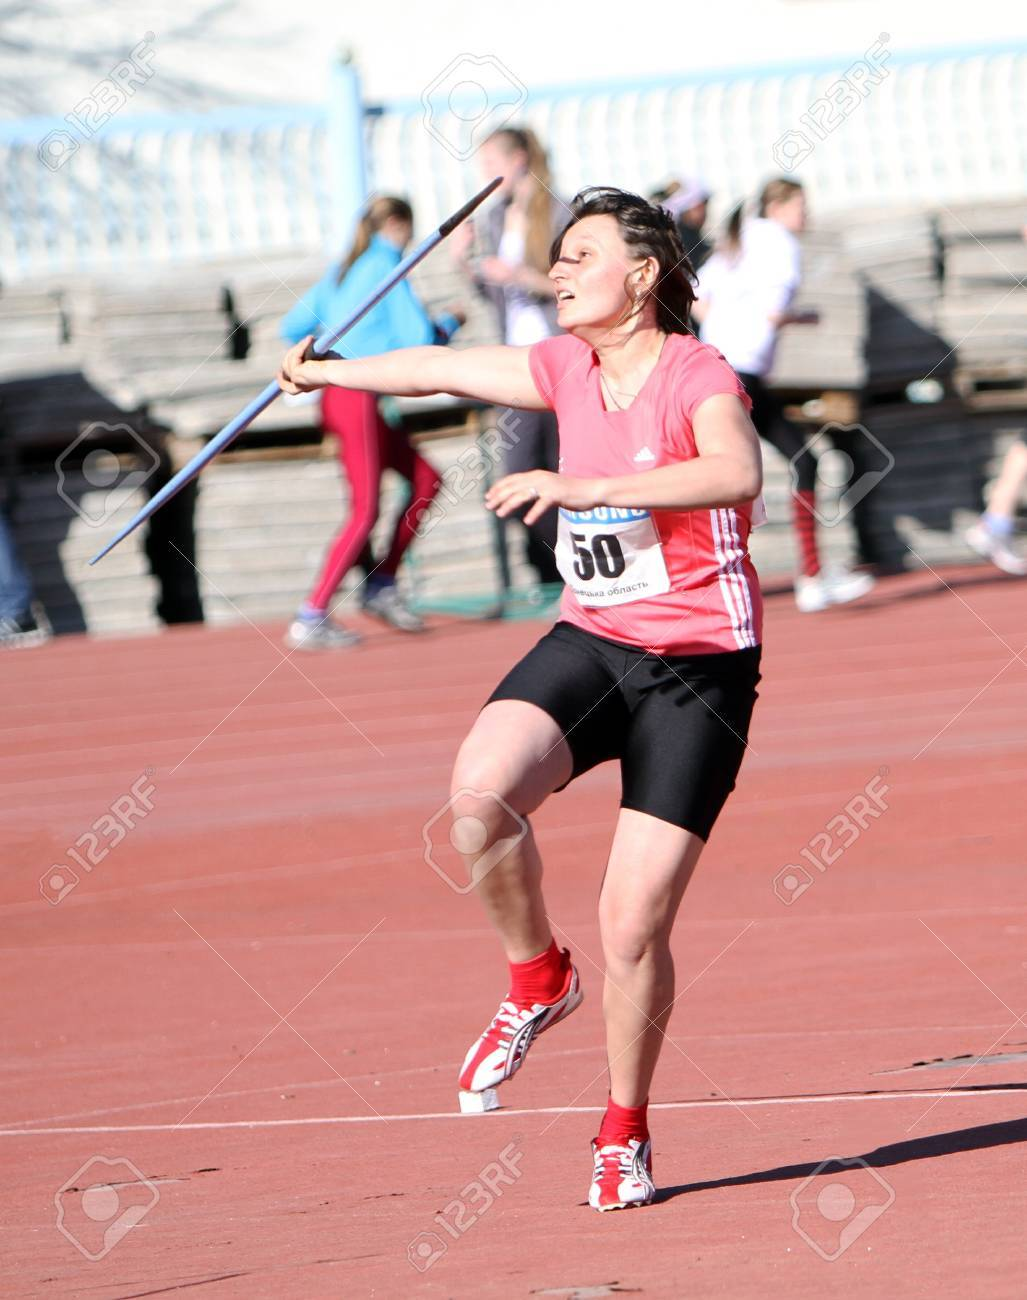 YALTA, UKRAINE - APRIL 25  Savchenko Natalia compete in the javelin throw competition for girls age 16-17 on Ukrainian Junior Track and Field Championships on April 25, 2012 in Yalta, Ukraine   Stock Photo - 13581109